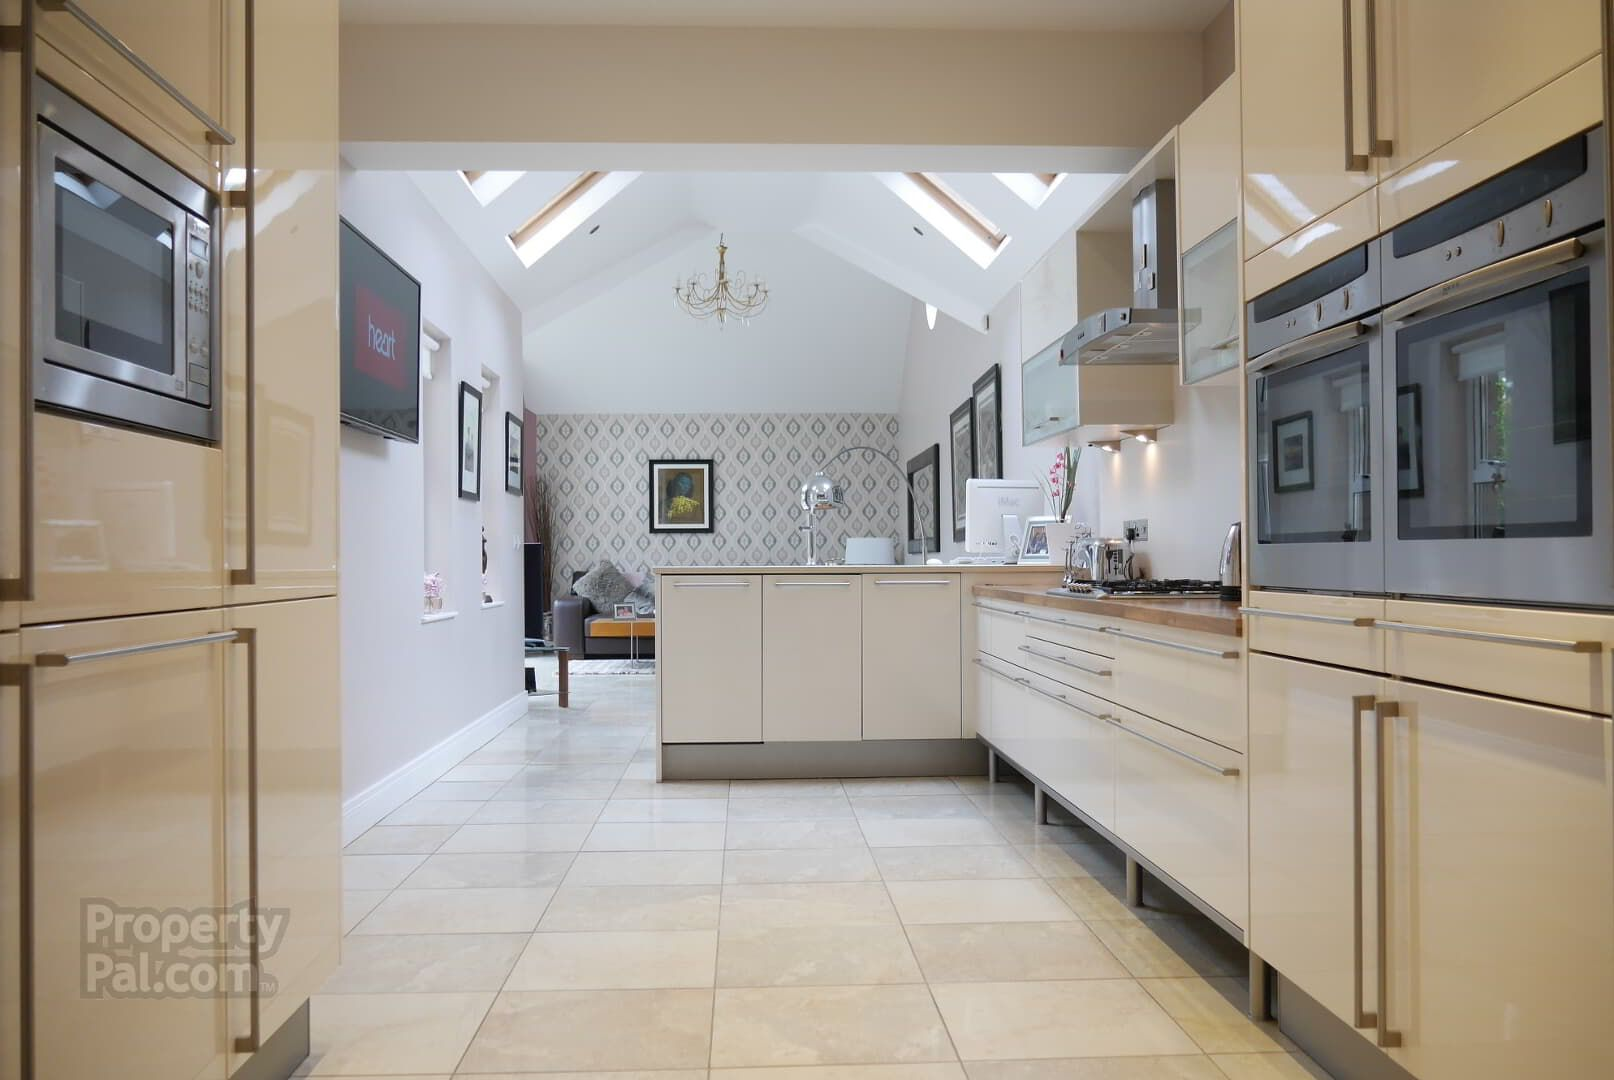 Property Pal 126 ballymoney road ballymena propertypal contemporary kitchens